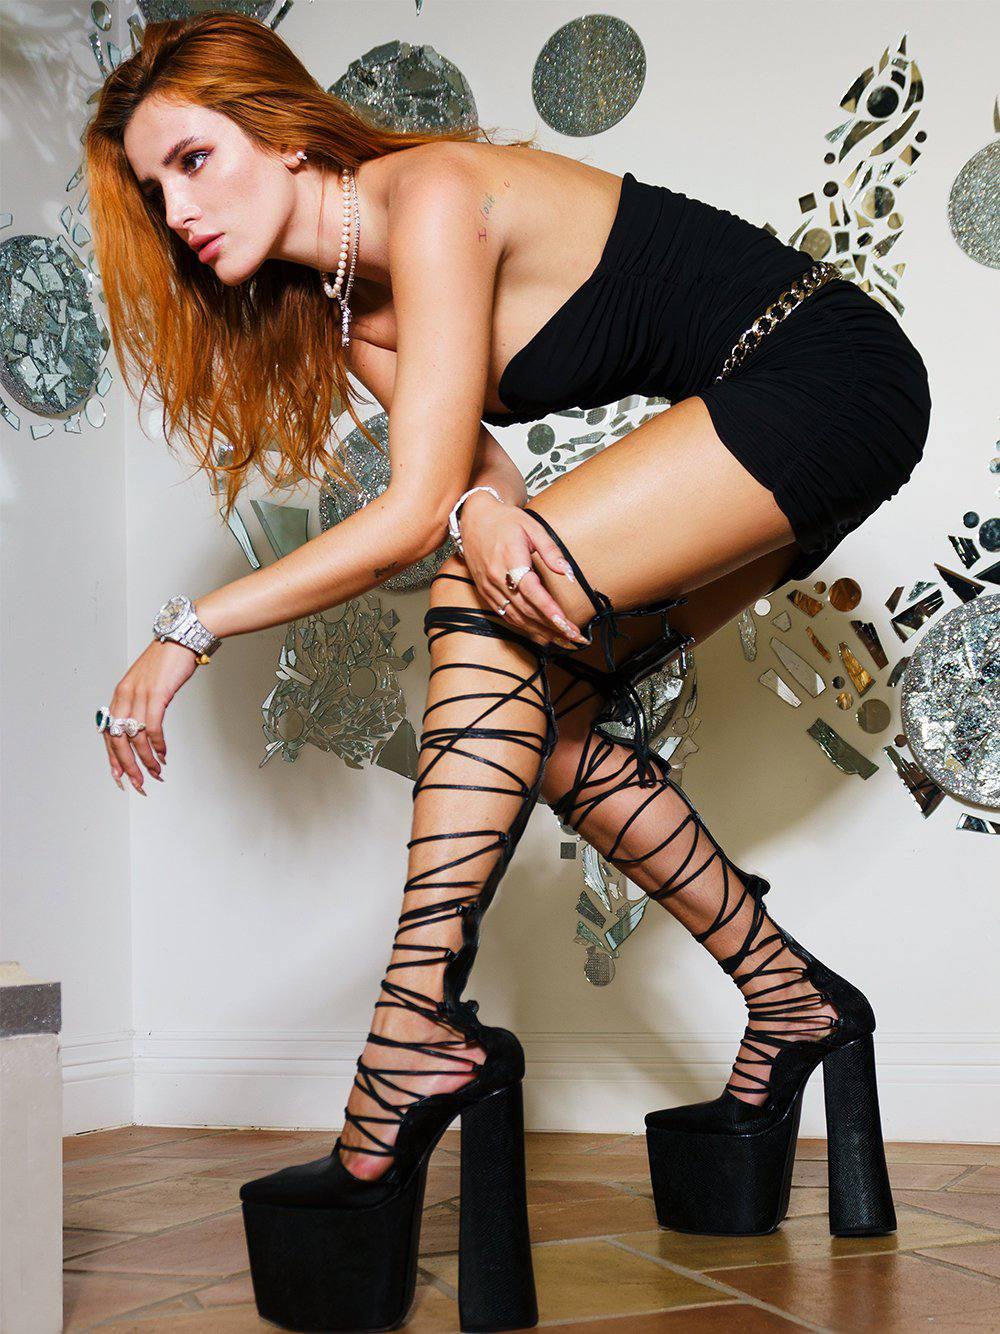 Bella Thorne Promotes ZCrave F3tish Campaign (35 Photos)